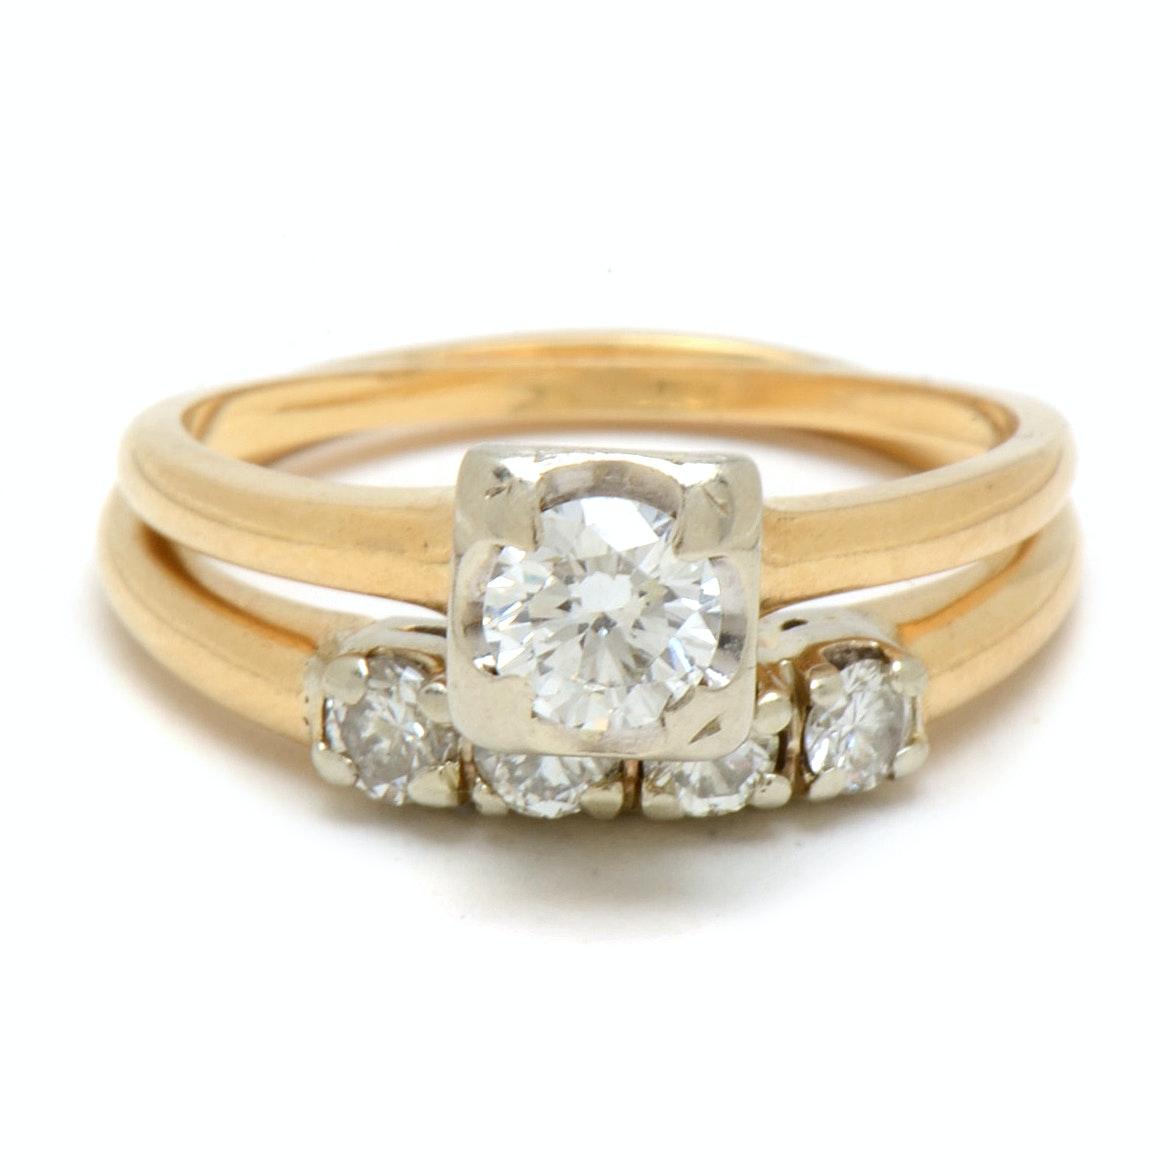 Vintage 14K Yellow Gold Diamond Bridal Set